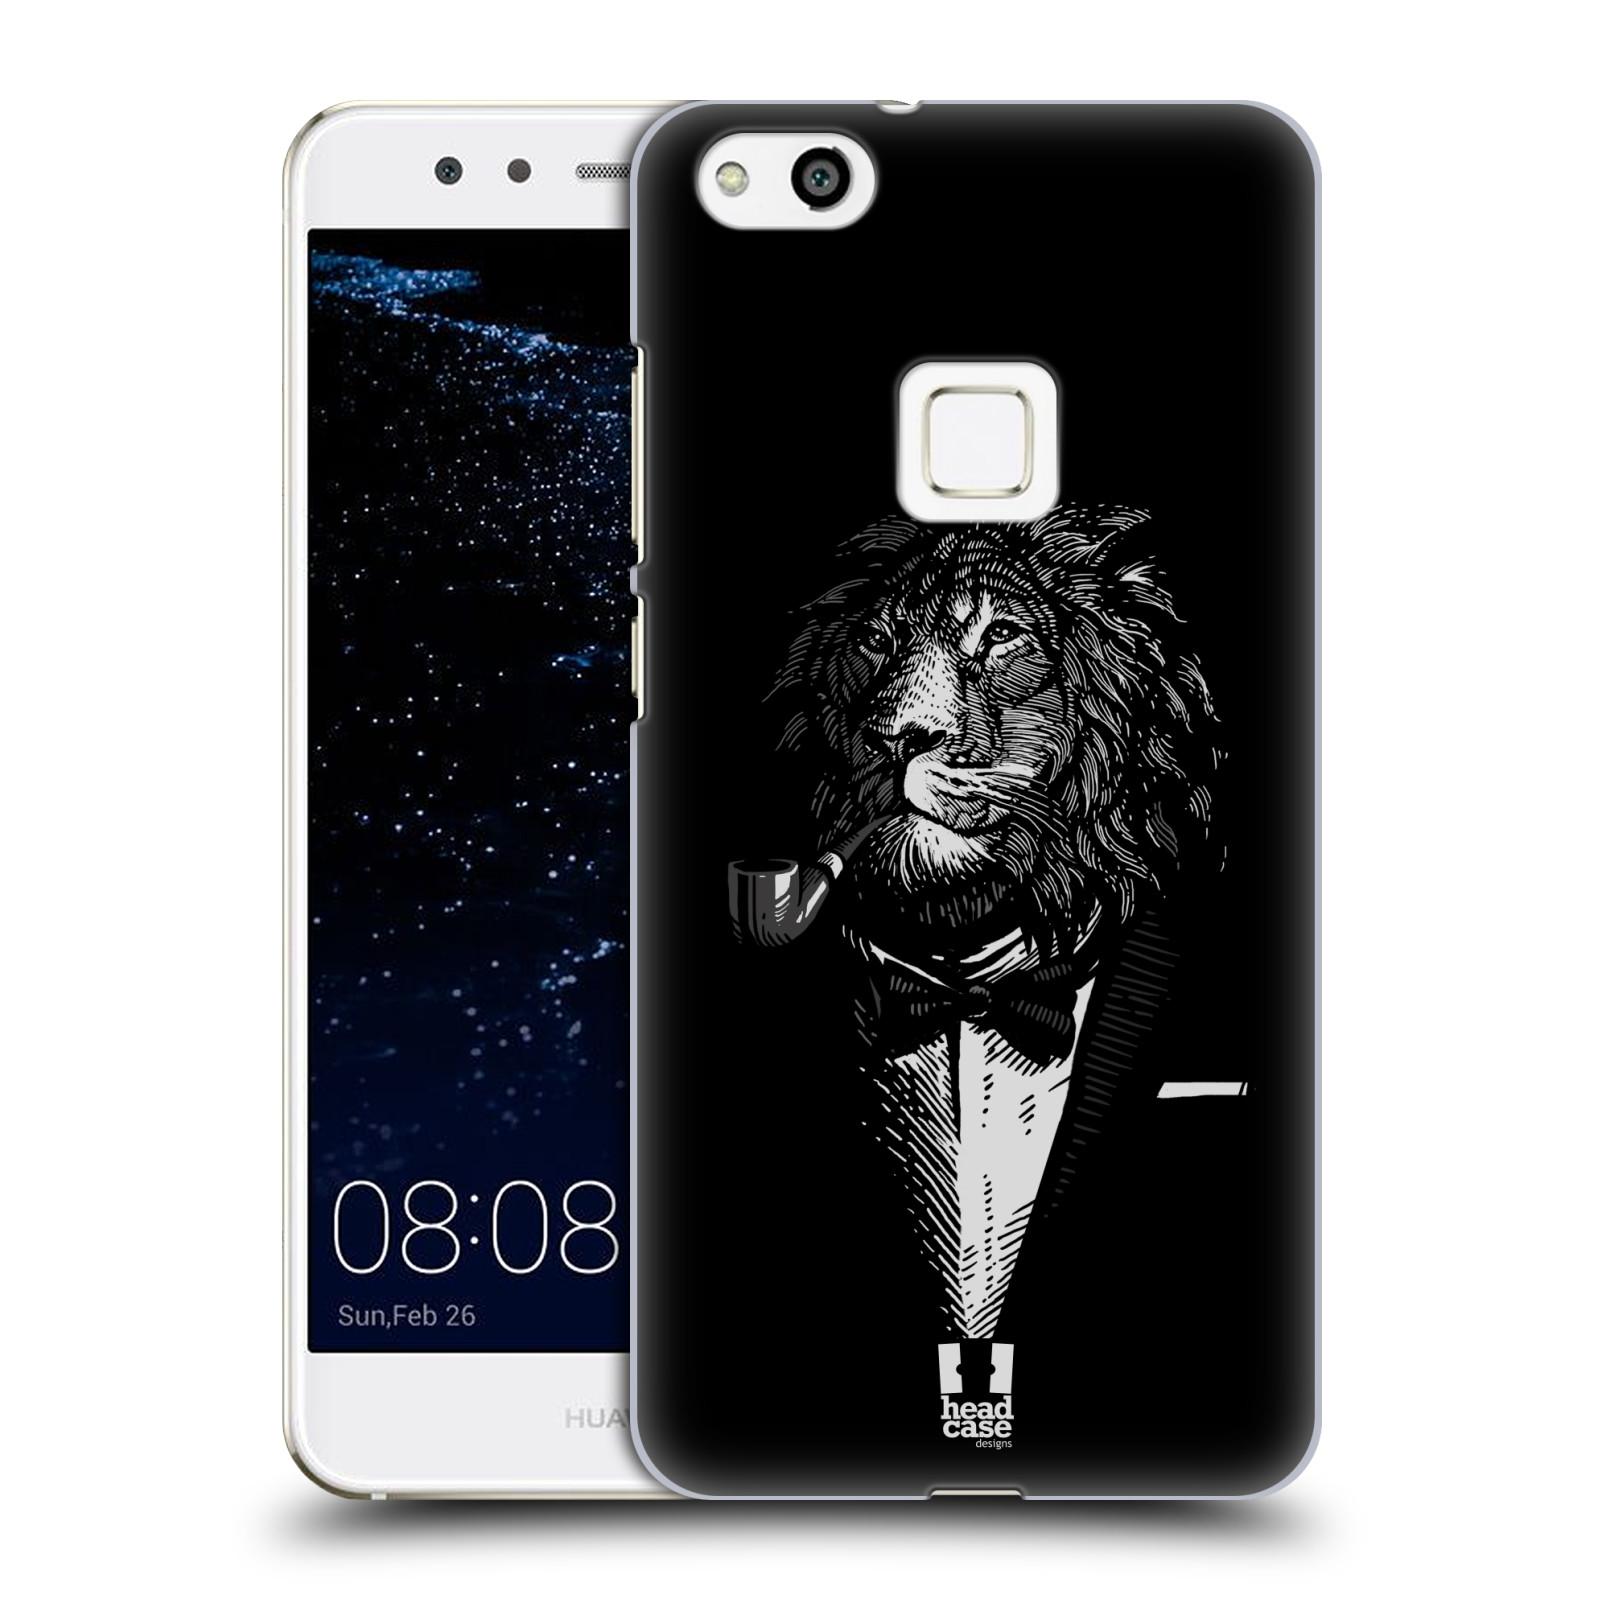 Plastové pouzdro na mobil Huawei P10 Lite Head Case - LEV V KVÁDRU (Plastový kryt či obal na mobilní telefon Huawei P10 Lite Dual SIM (LX1/LX1A))